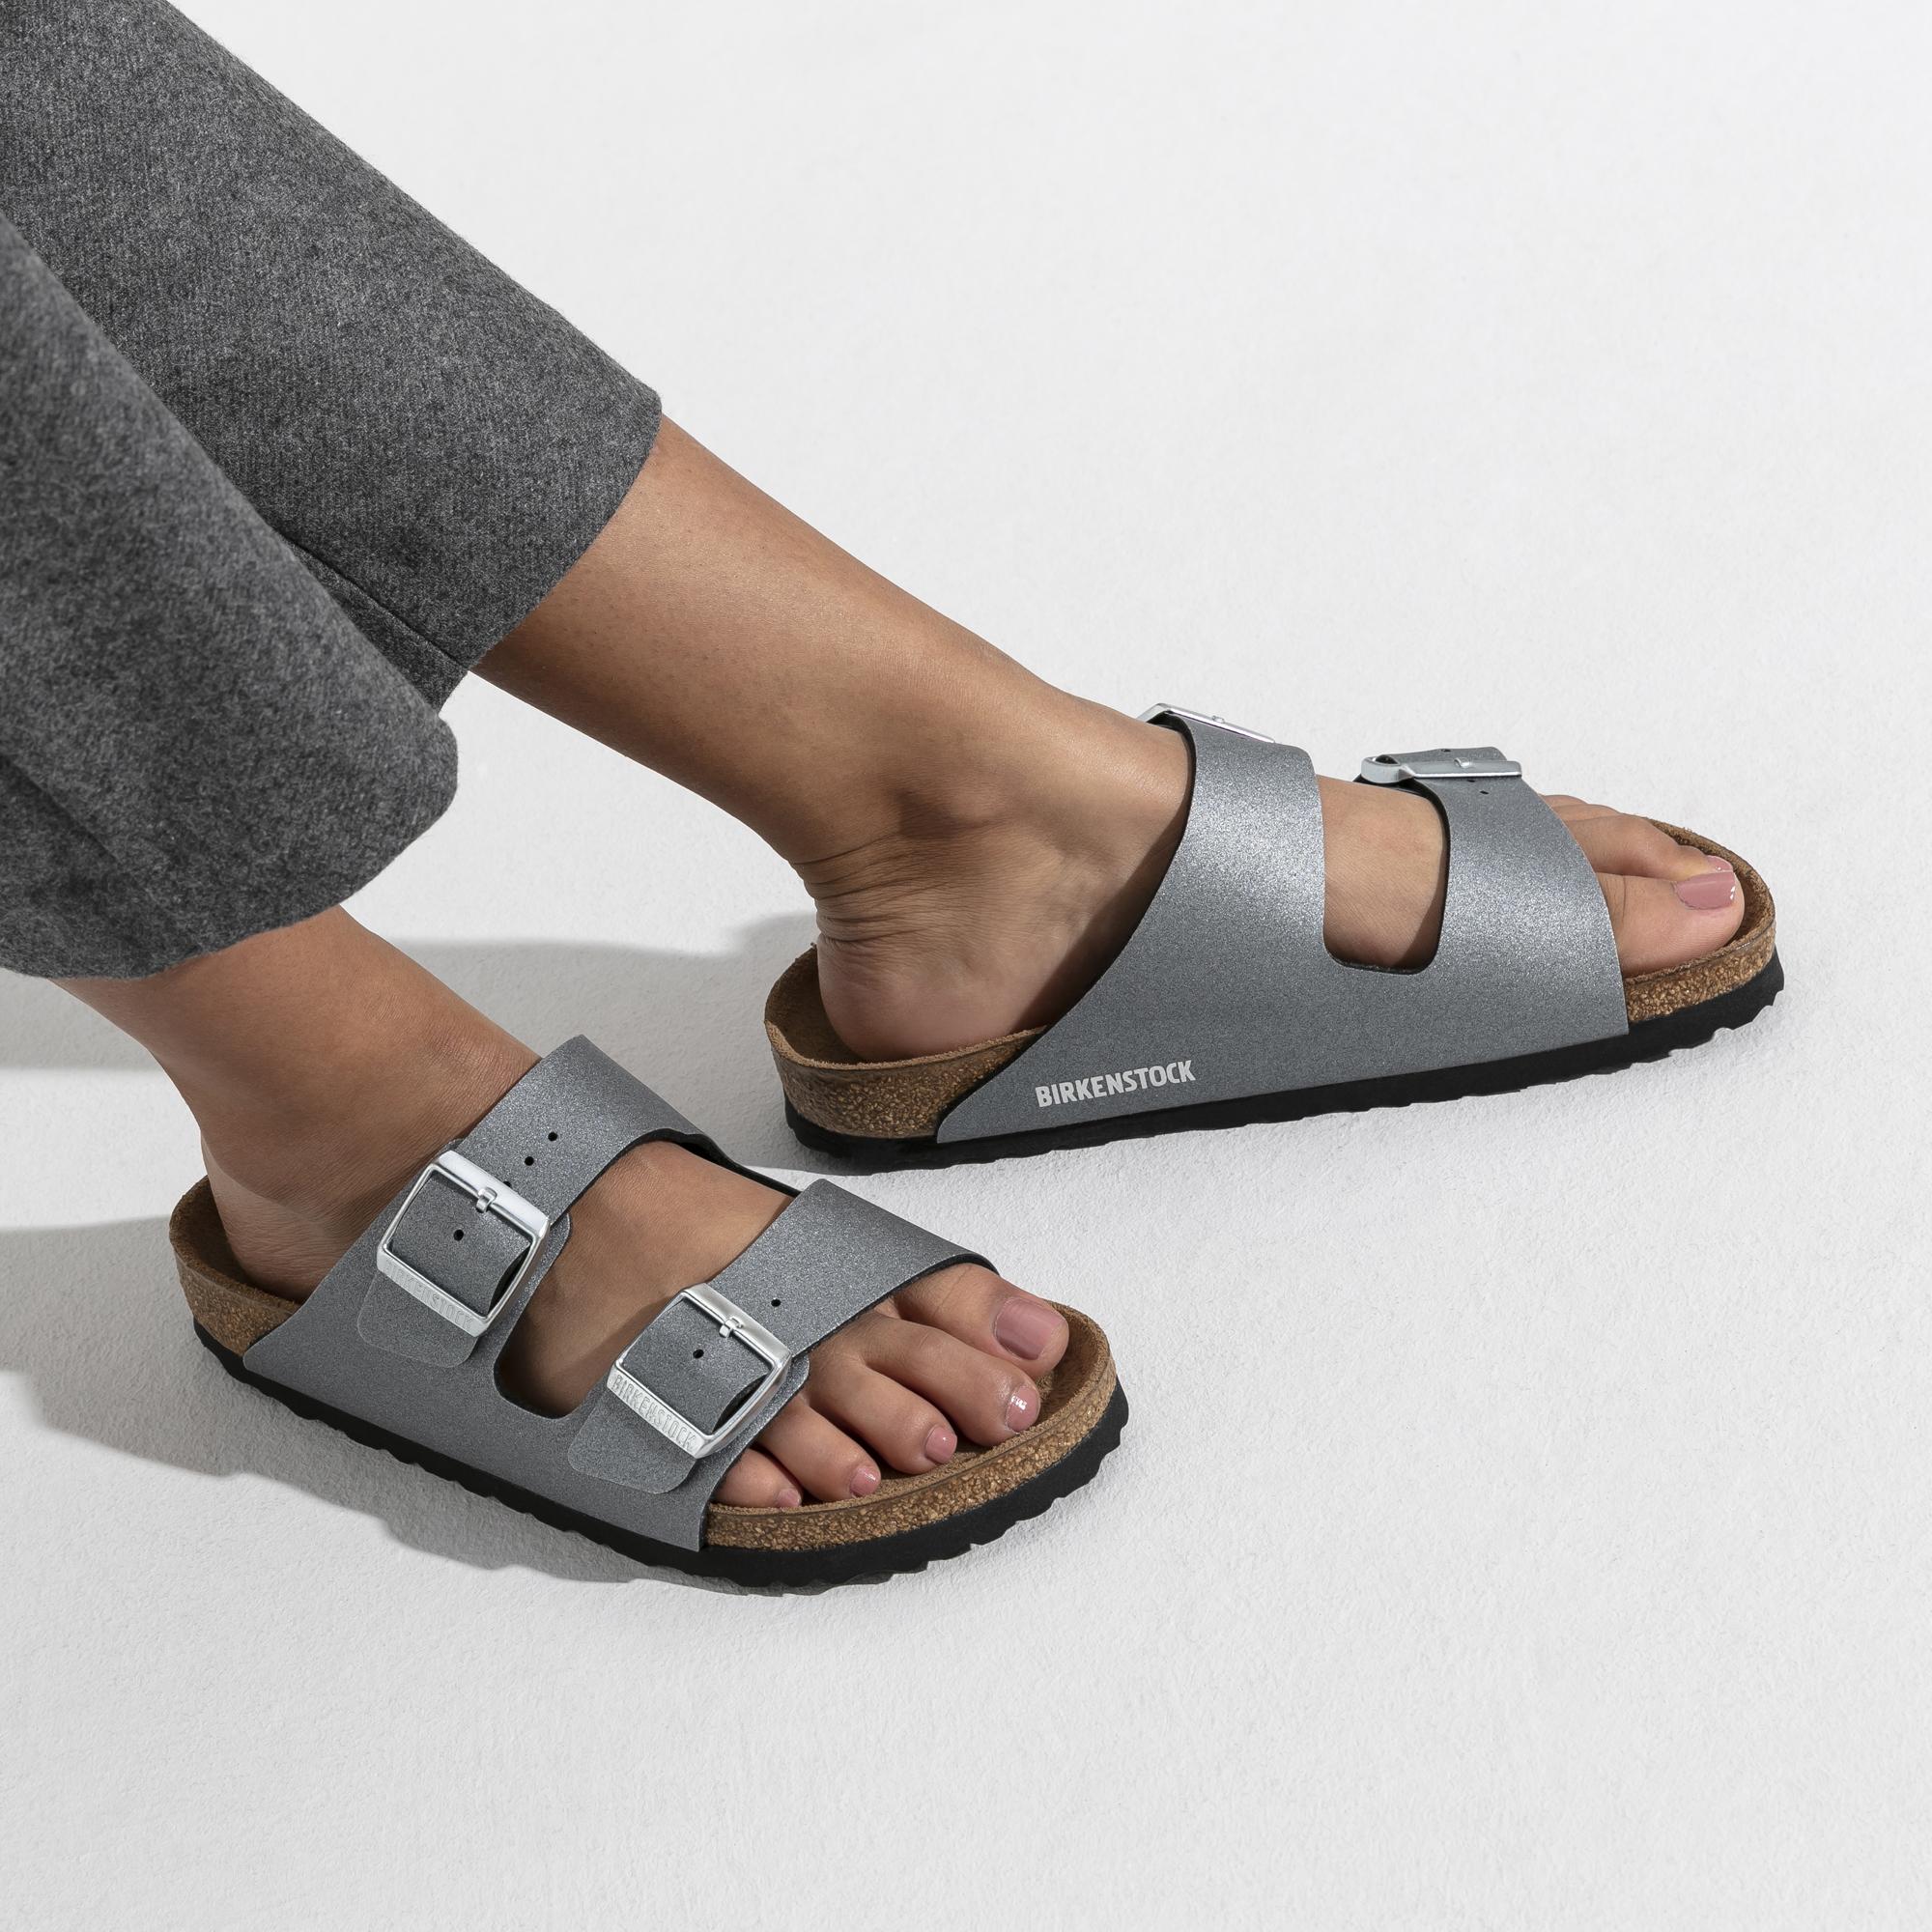 Birkenstock Arizona BF Sandals Icy Metallic Anthracite